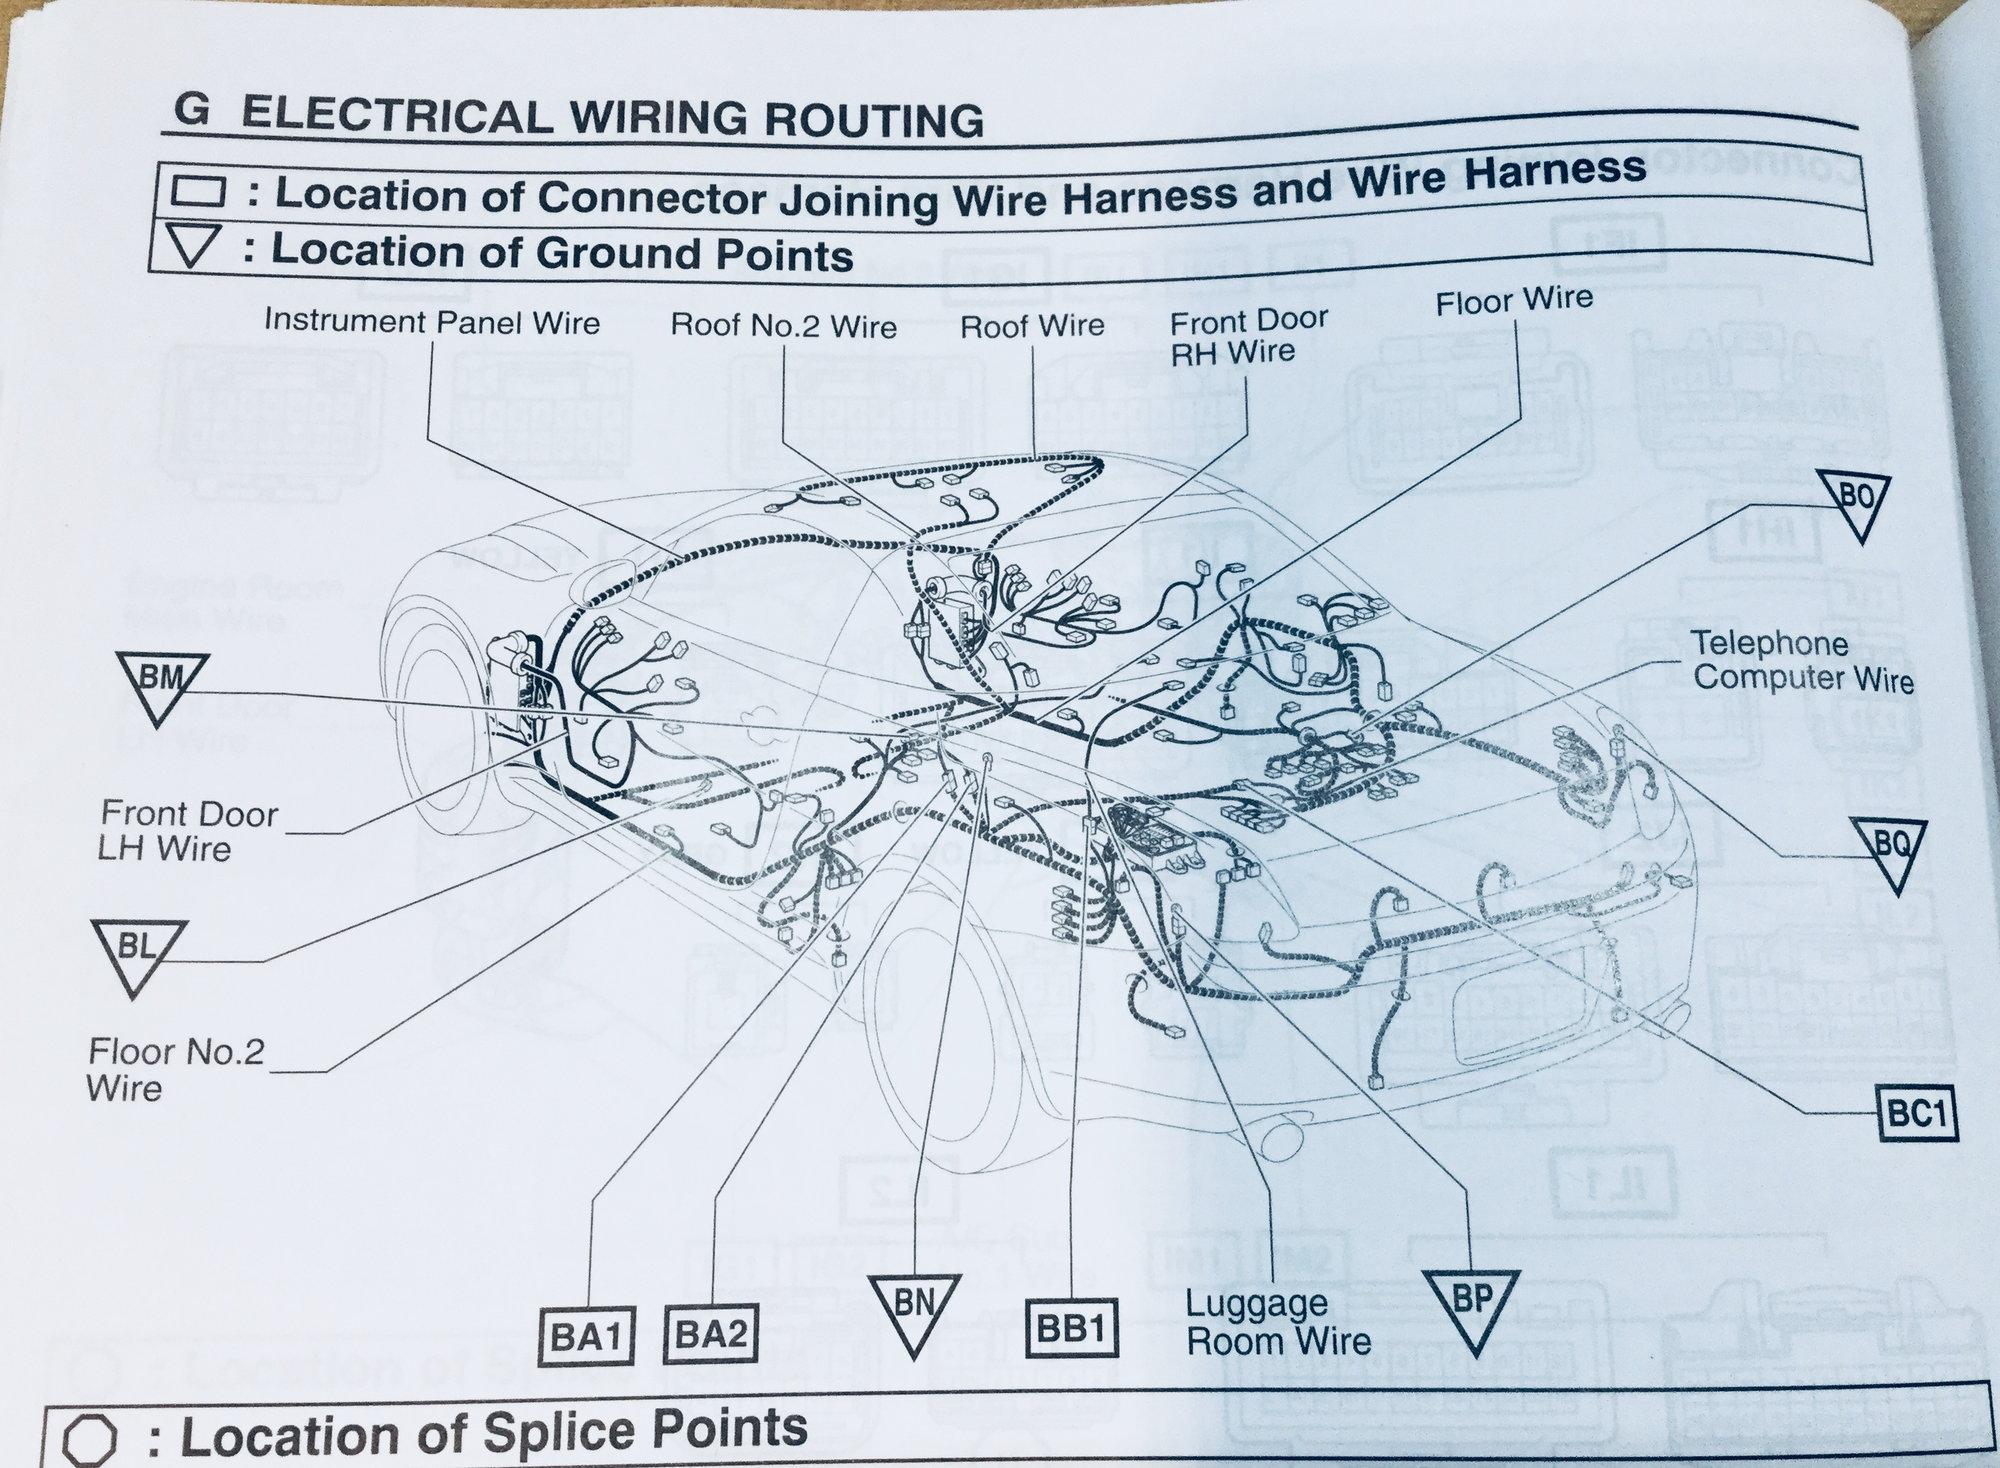 [QNCB_7524]  Lexus Sc 430 Wiring Diagram - Wiring A 110 Schematic for Wiring Diagram  Schematics | 2002 Lexus Sc430 Wiring Diagram |  | Wiring Diagram Schematics